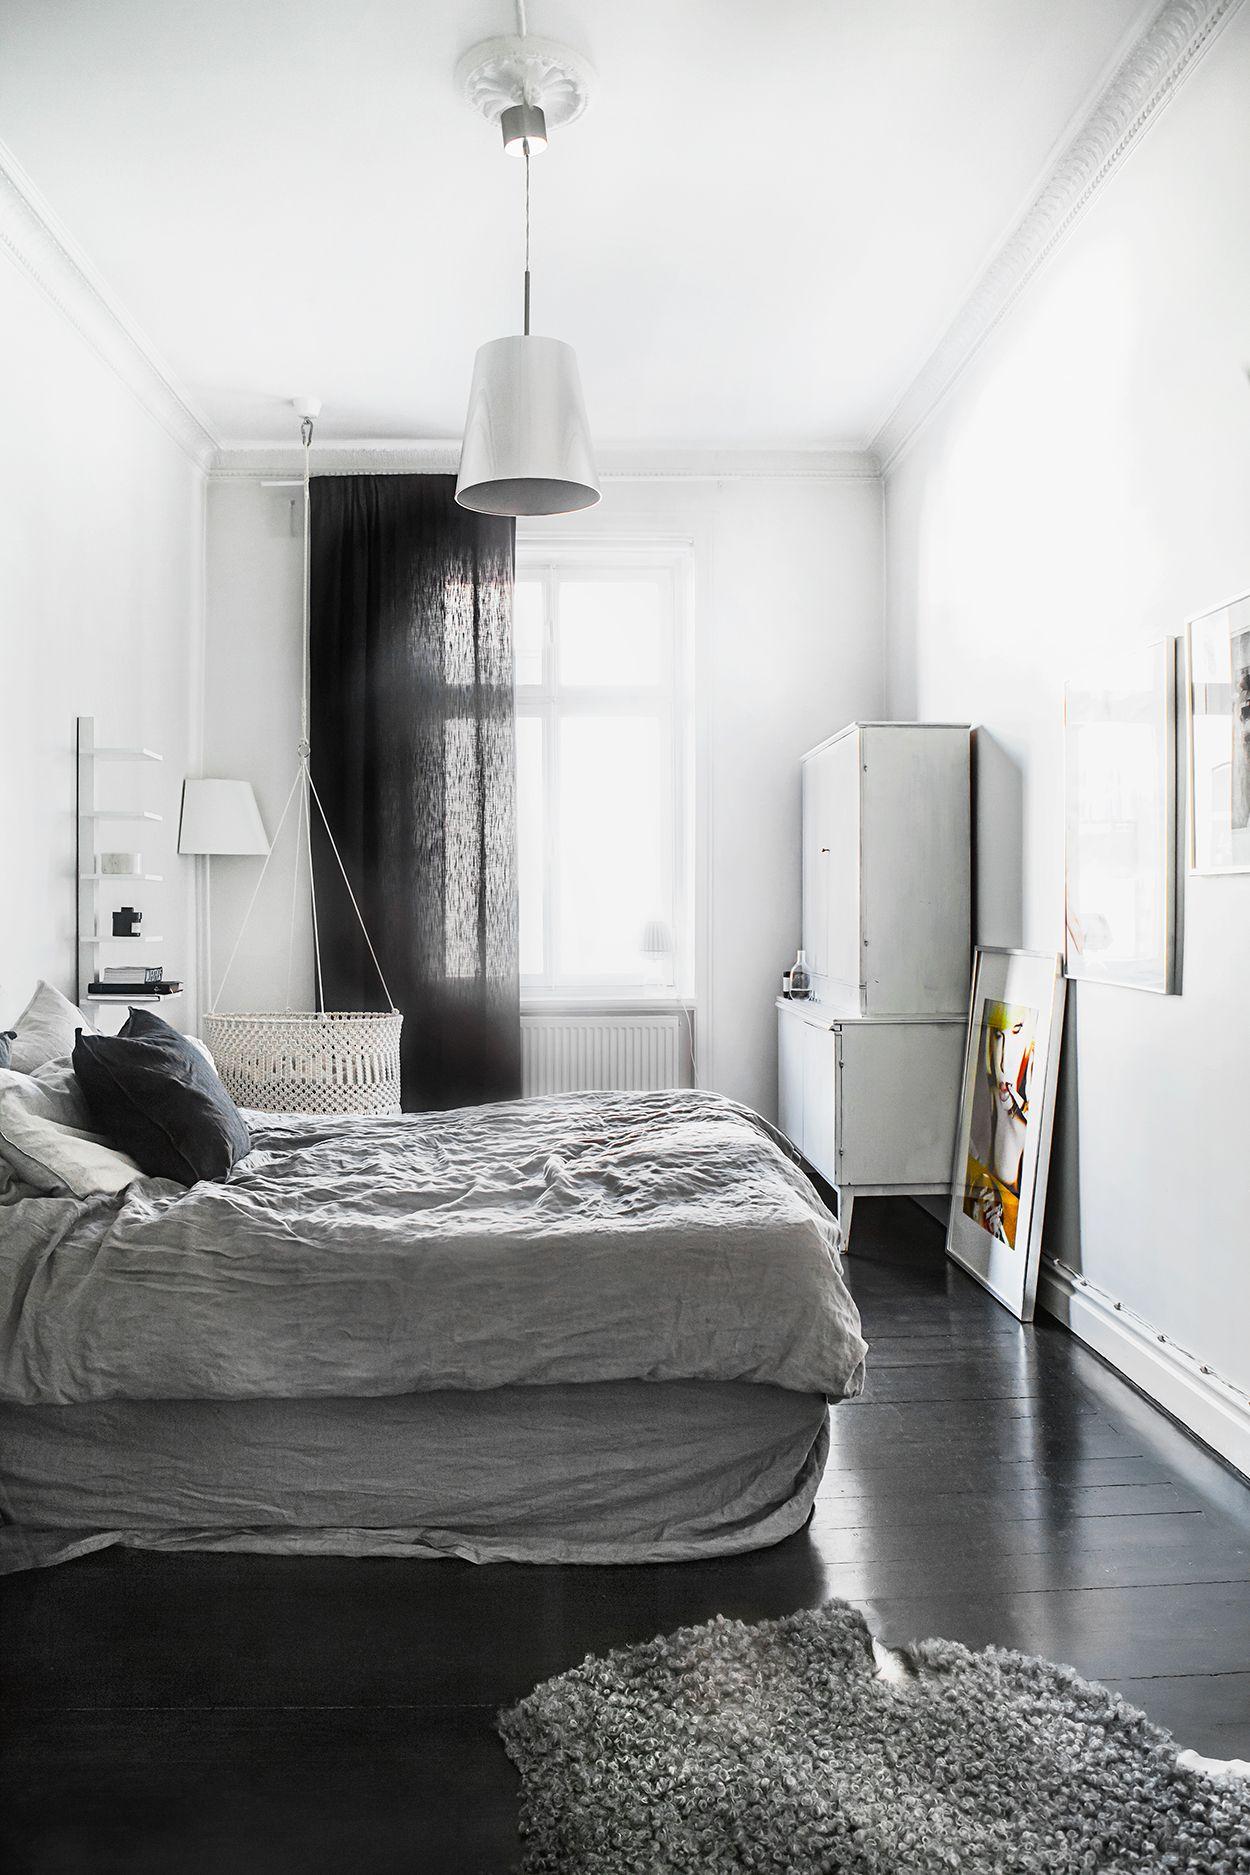 What I Want My Bedroom To Look Like With Black Wooden Floors White Wall Bedroom Bedroom Wooden Floor Bedroom Interior